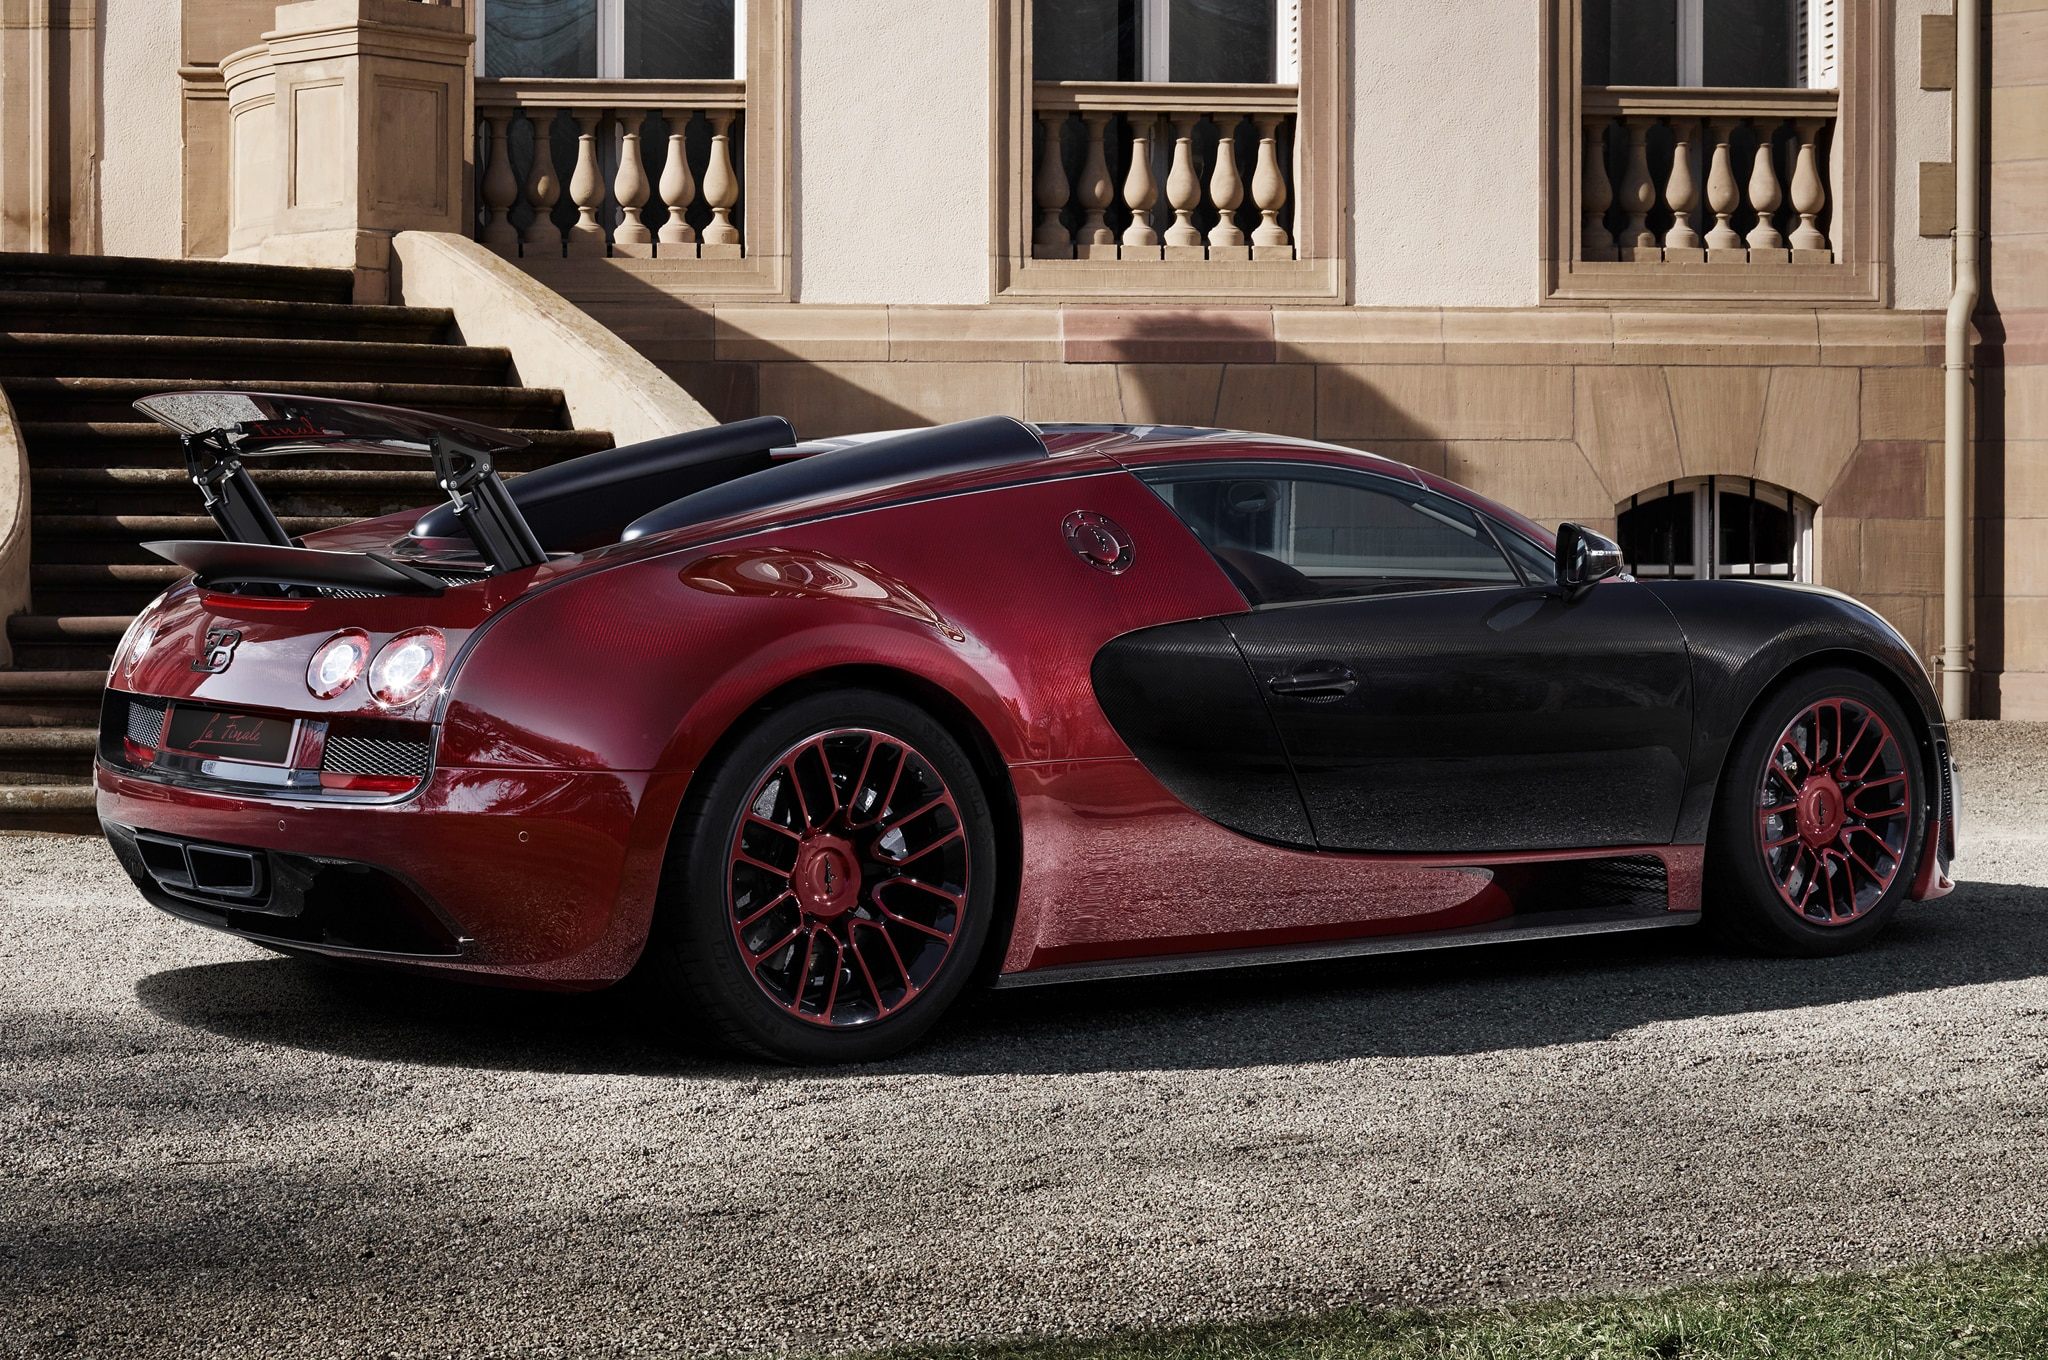 Bugatti Bids Farewell to Veyron with One-off La Finale Edition